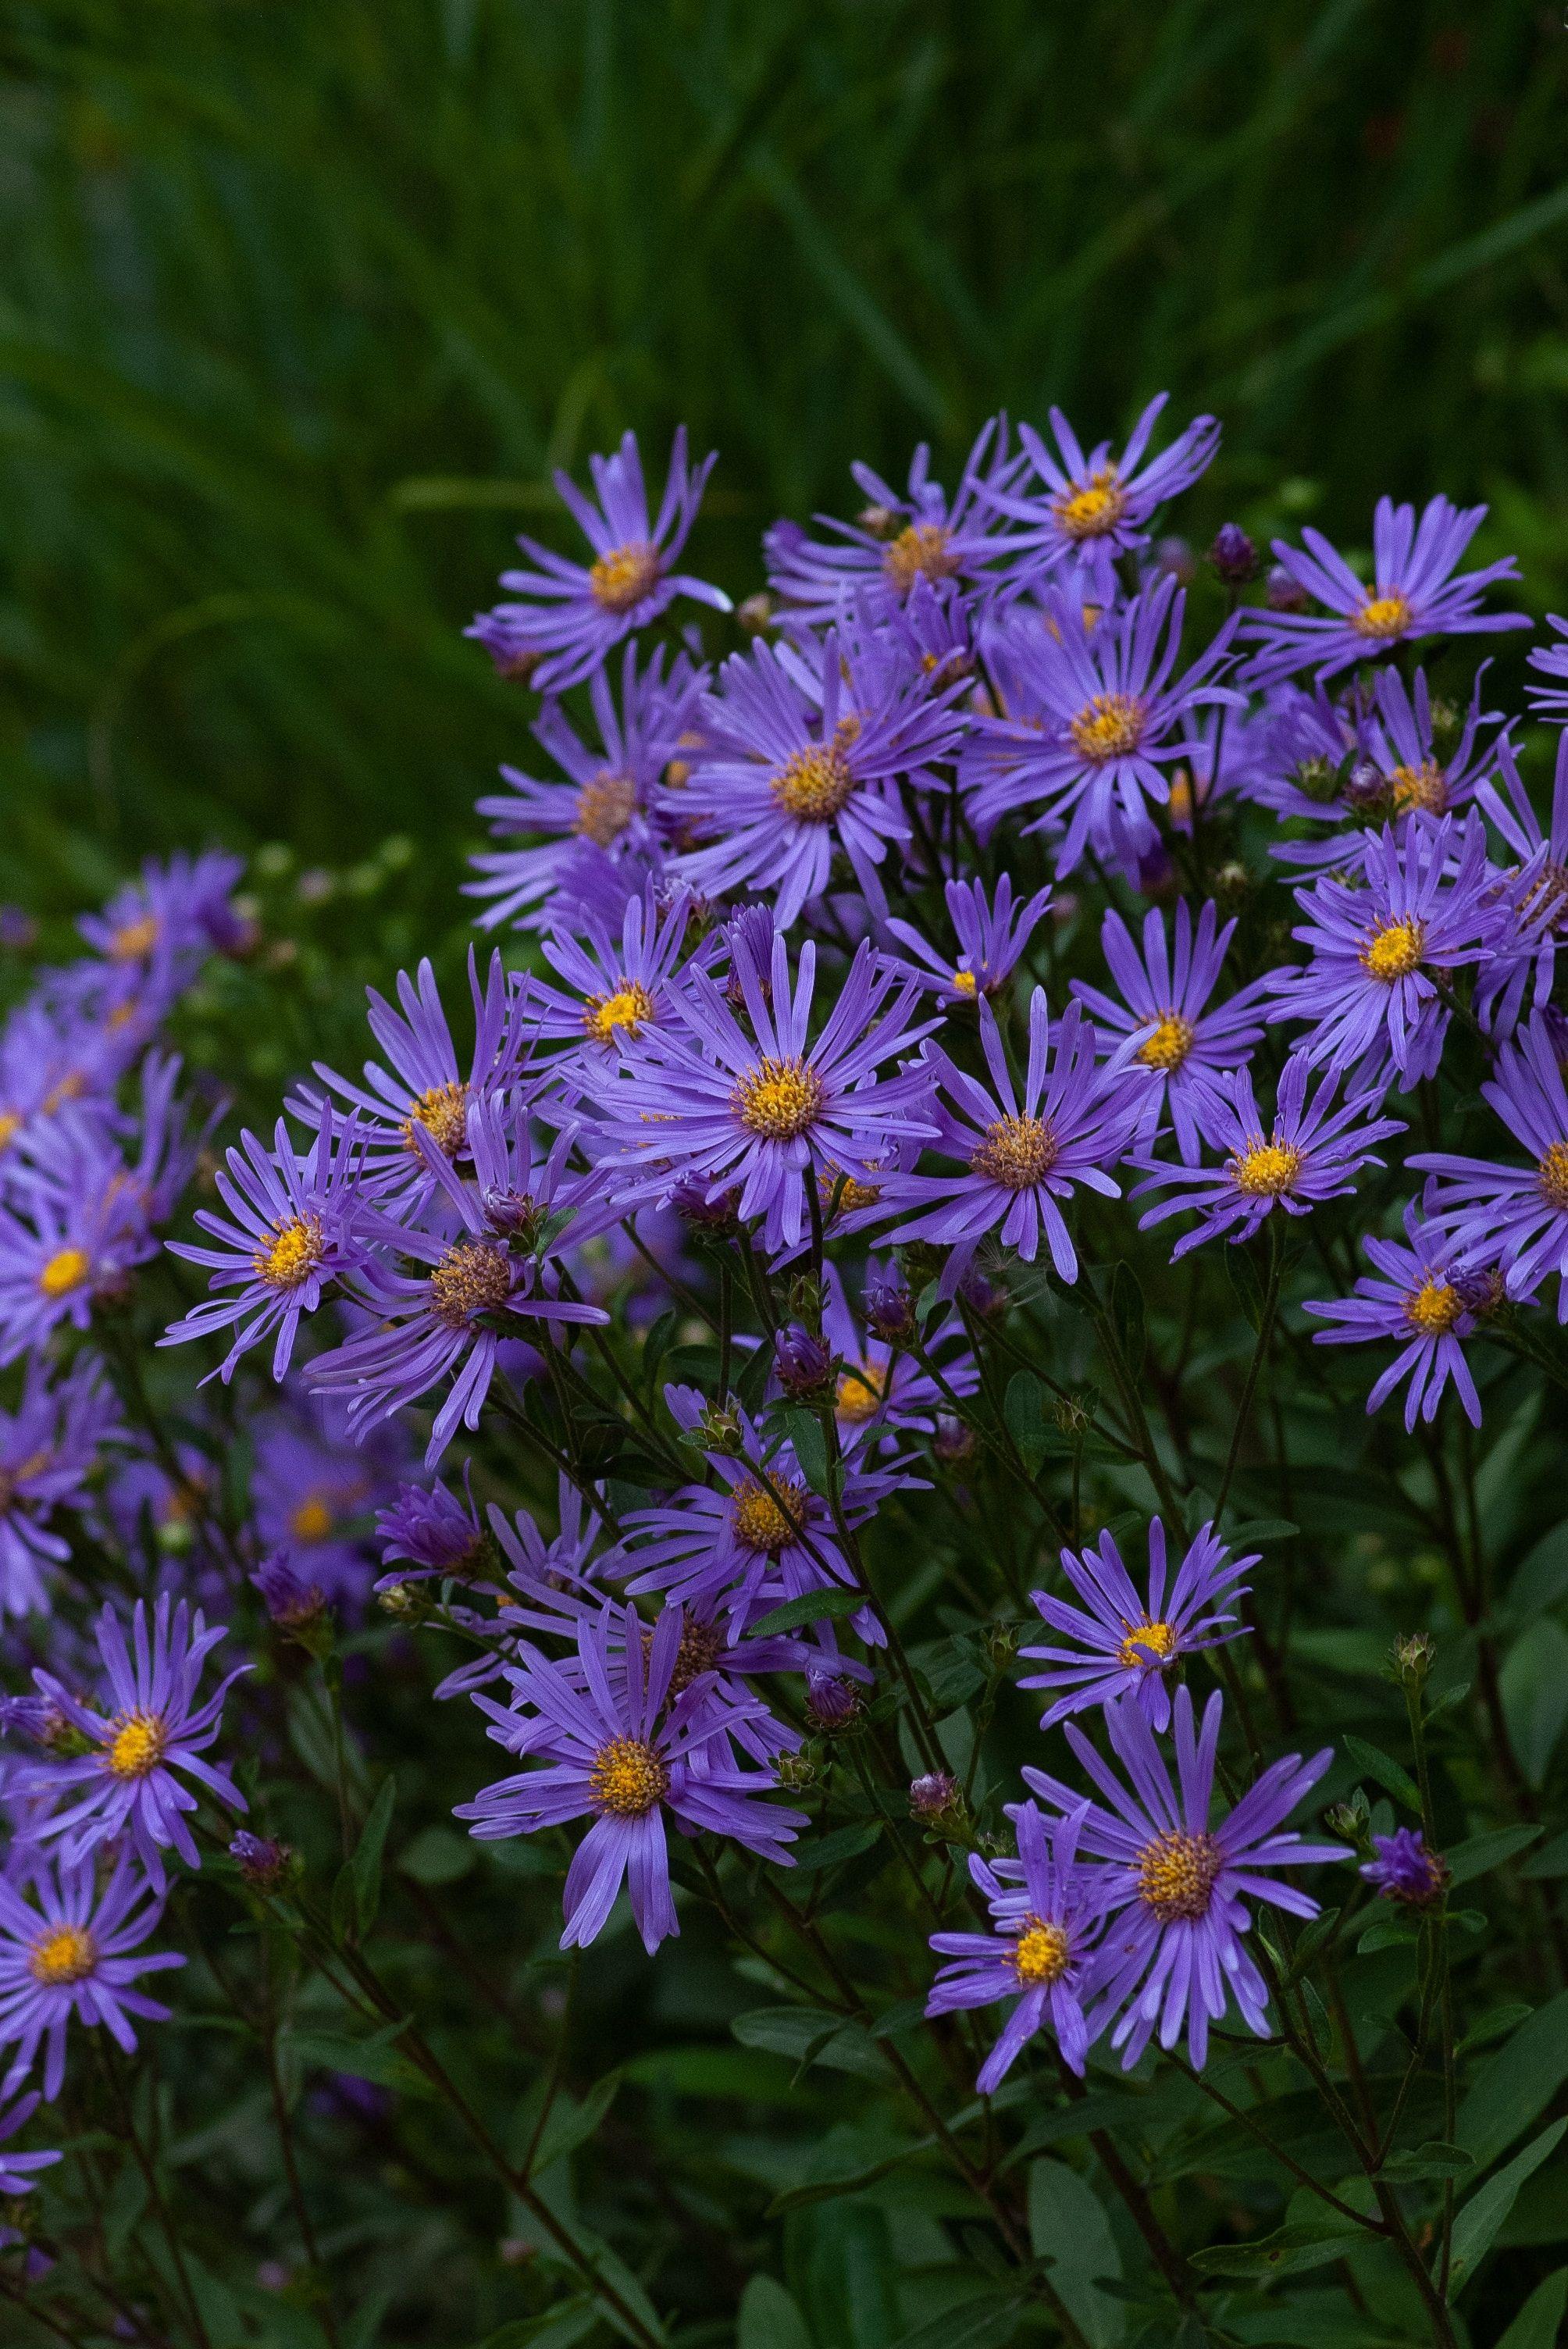 Pentax Corporation Pentax K100d Super 9889e6 Aster Flower White Flowering Plants Flower Pictures